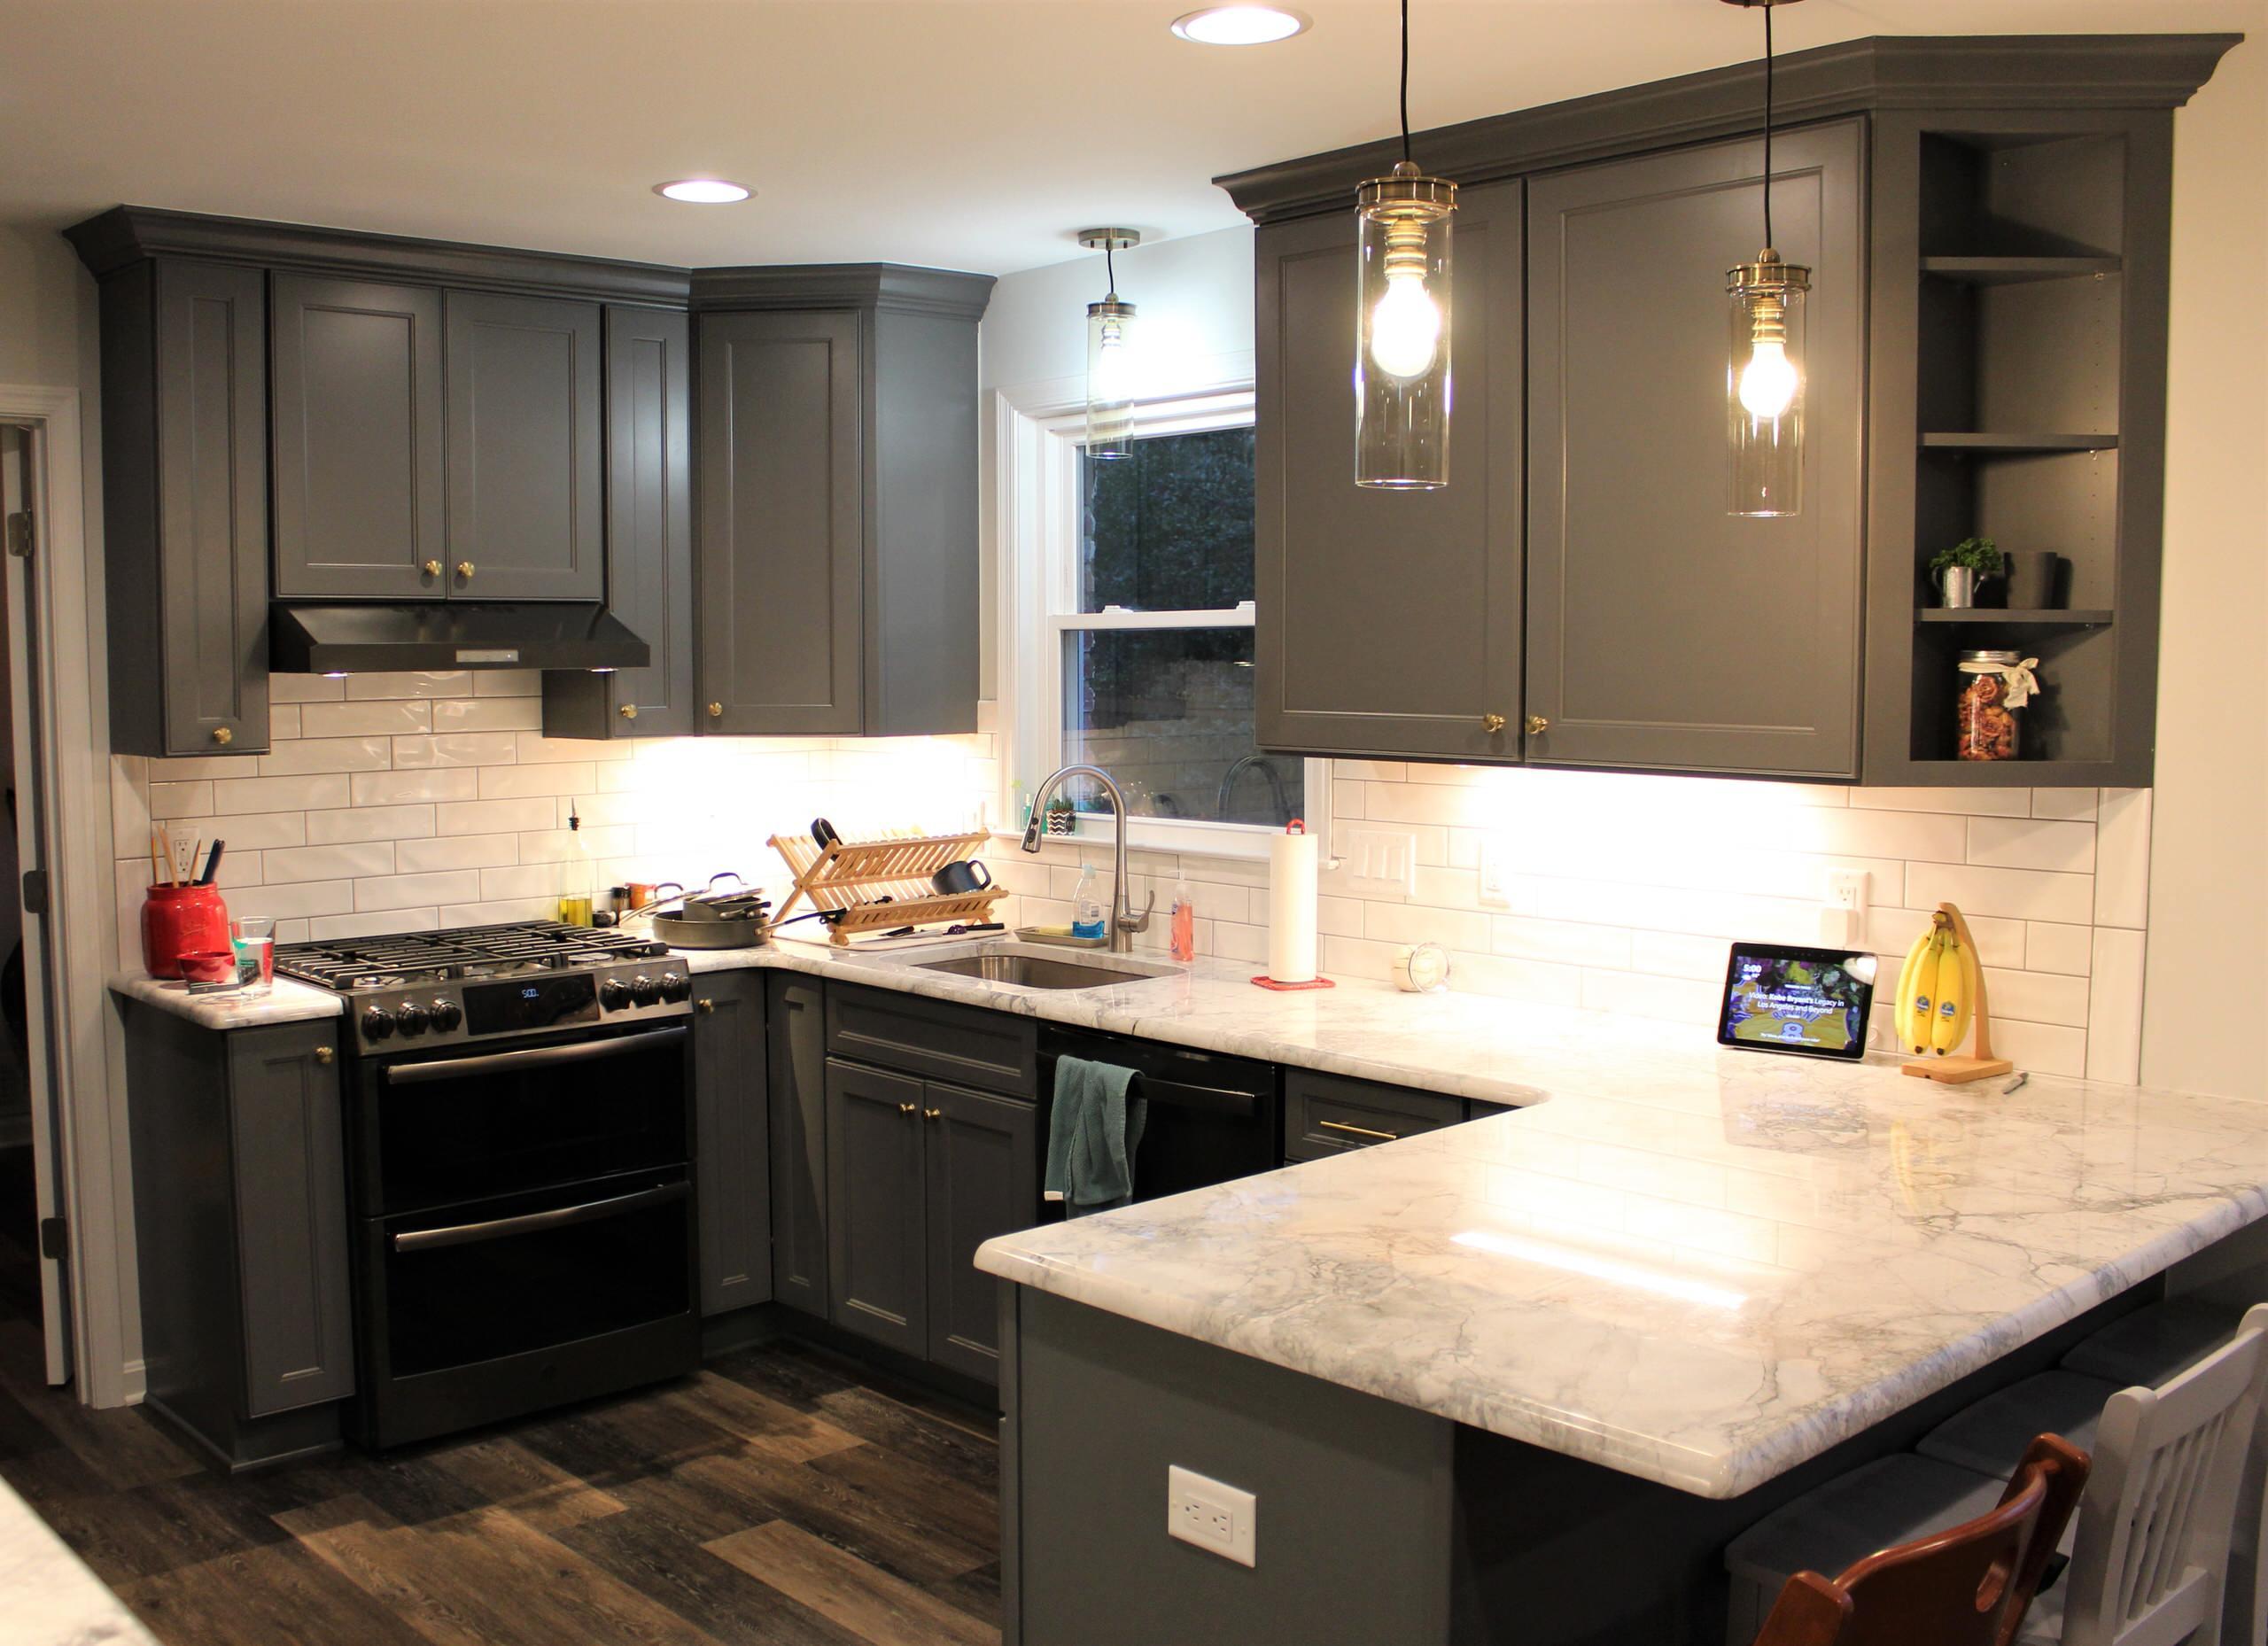 Remodeling Older Homes Kitchen Ideas Photos Houzz